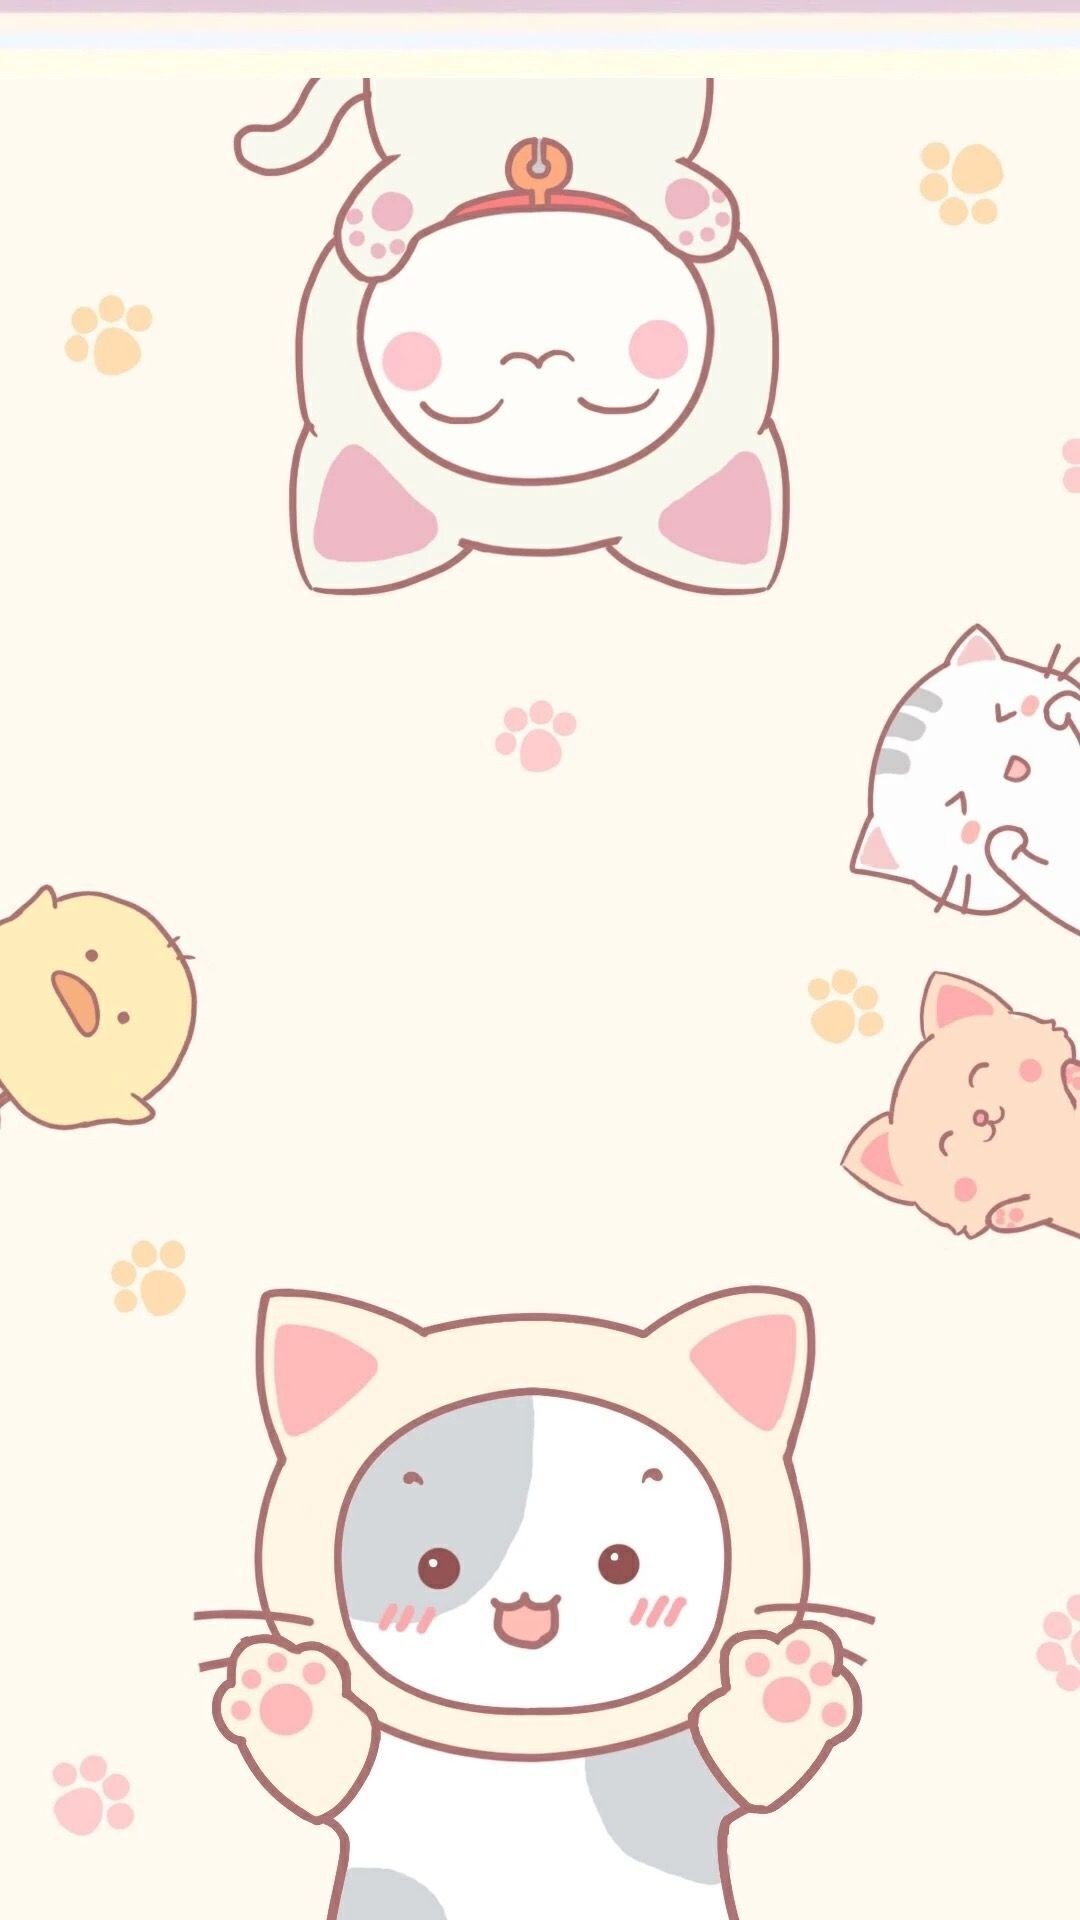 Cute Kawaii Wallpaper 70 Images